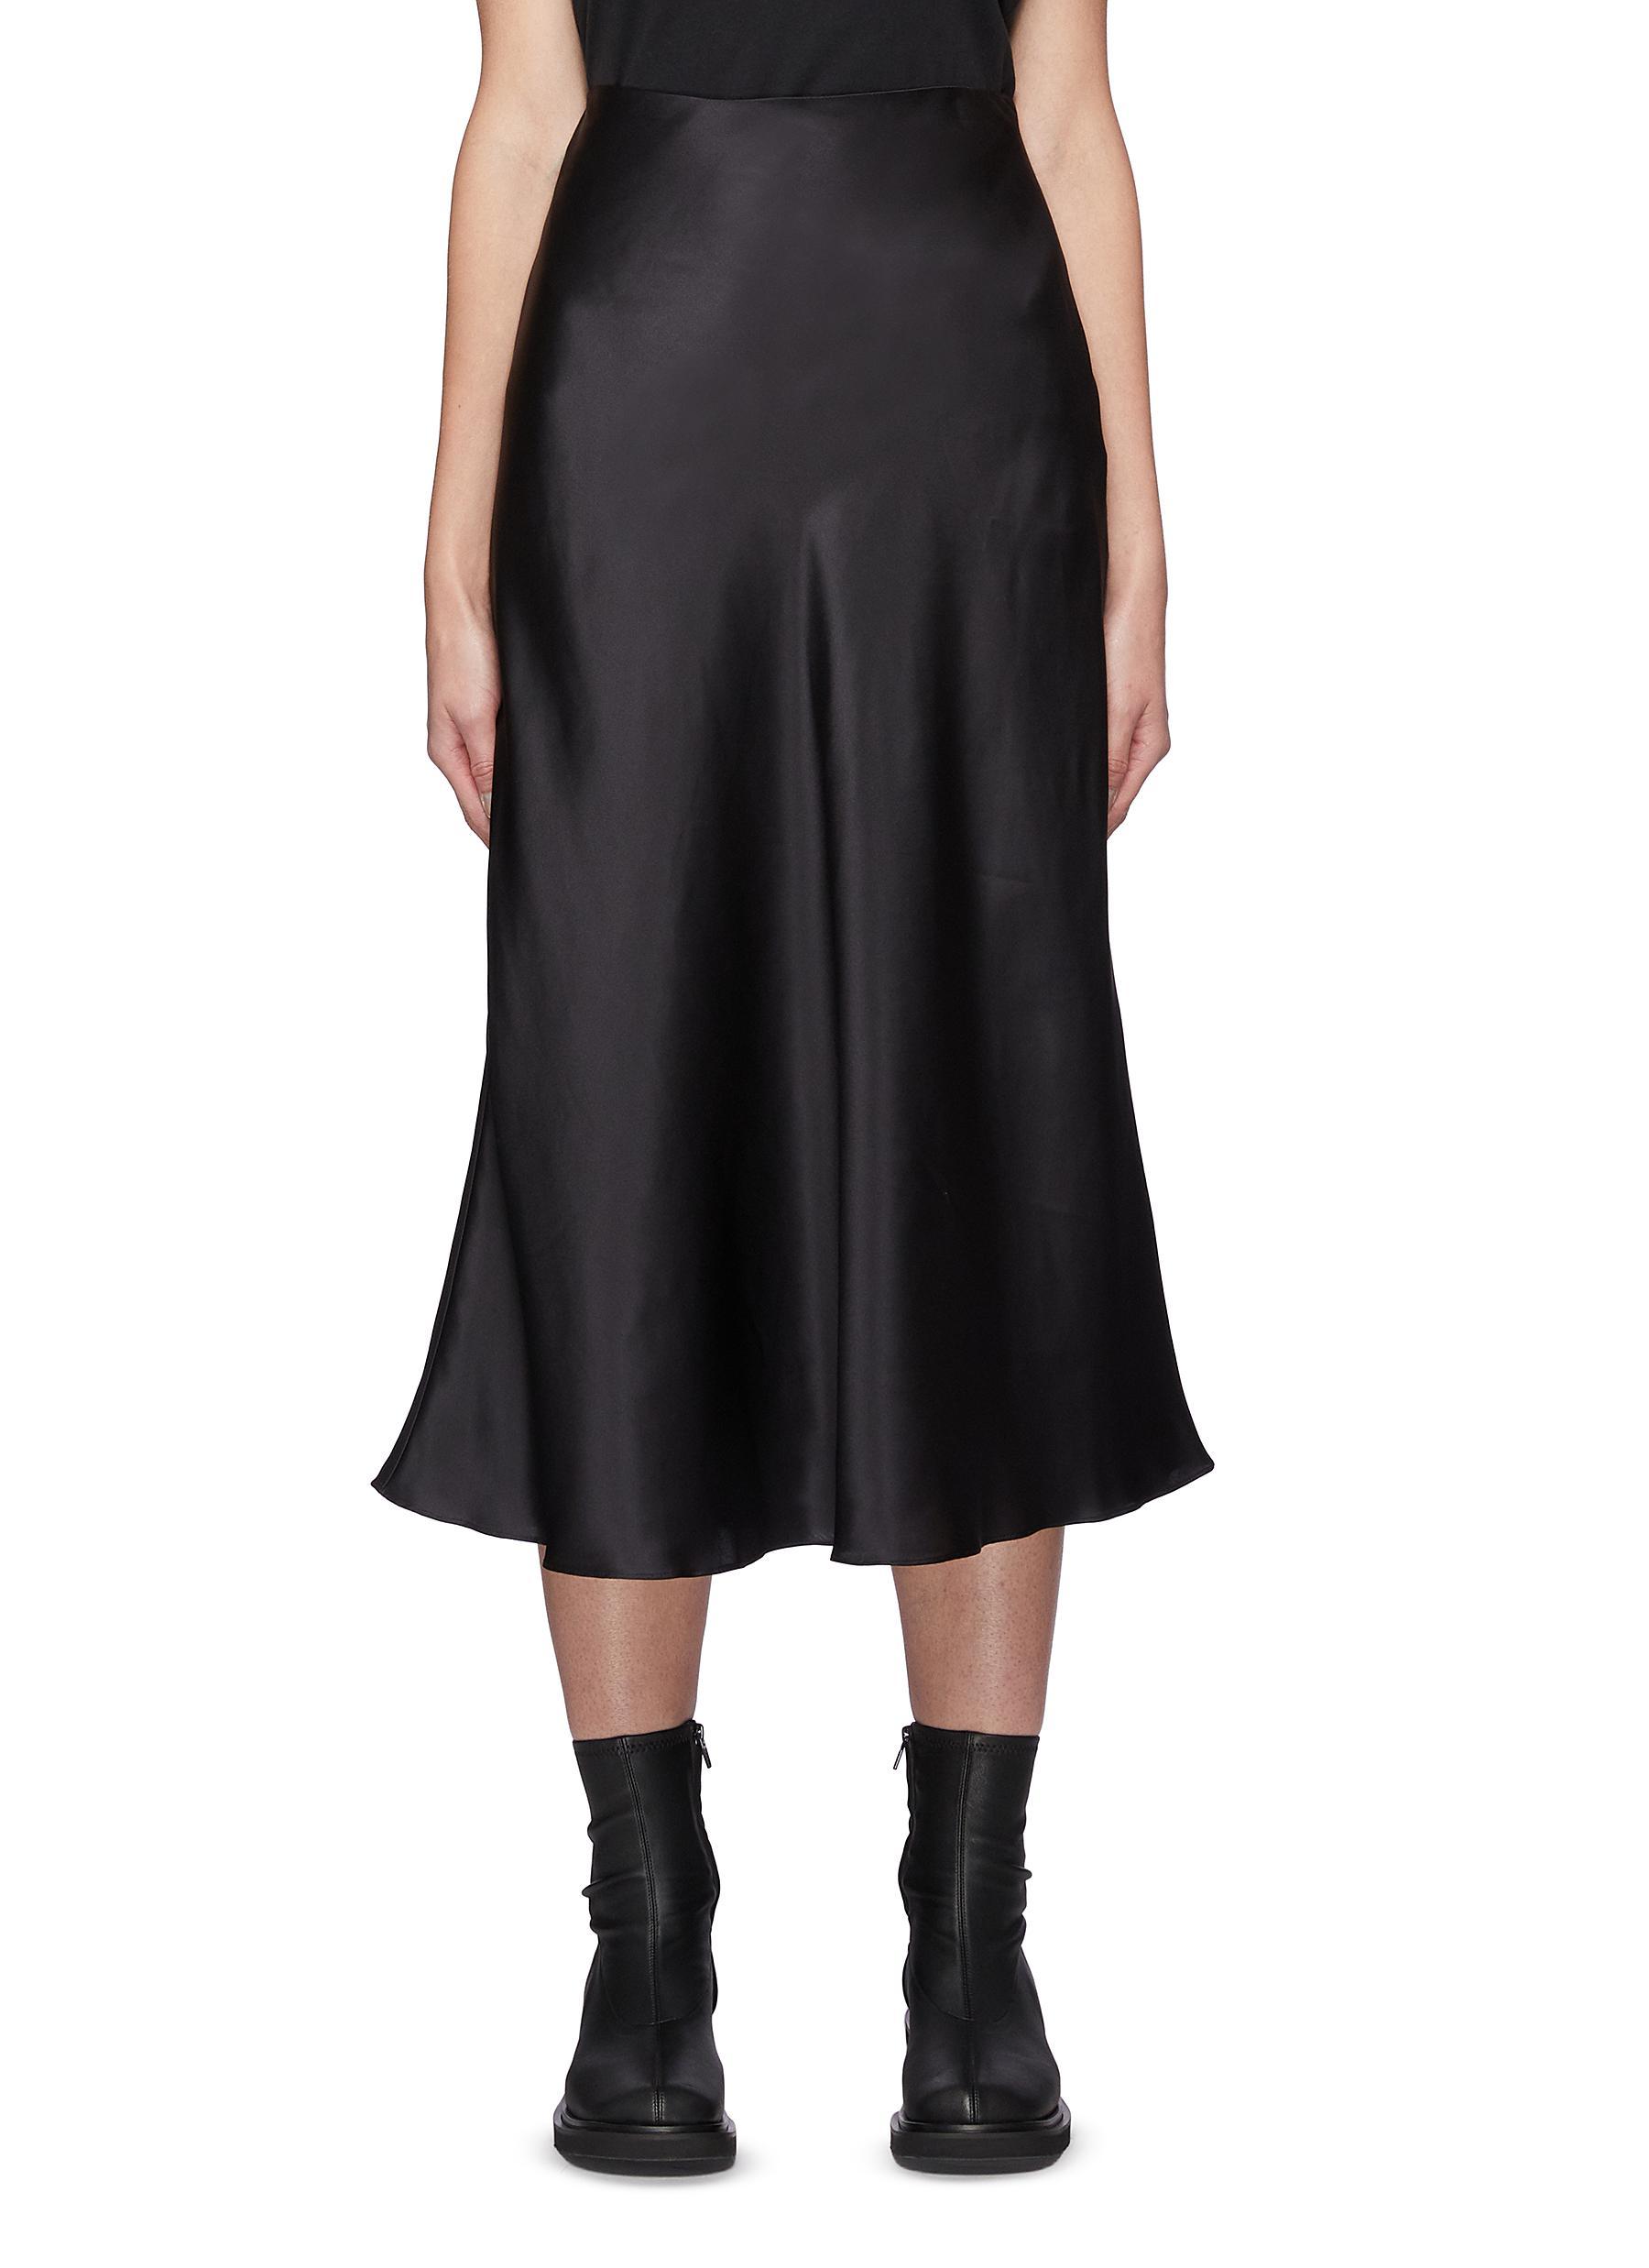 Aksou' Flared Silk Midi Skirt